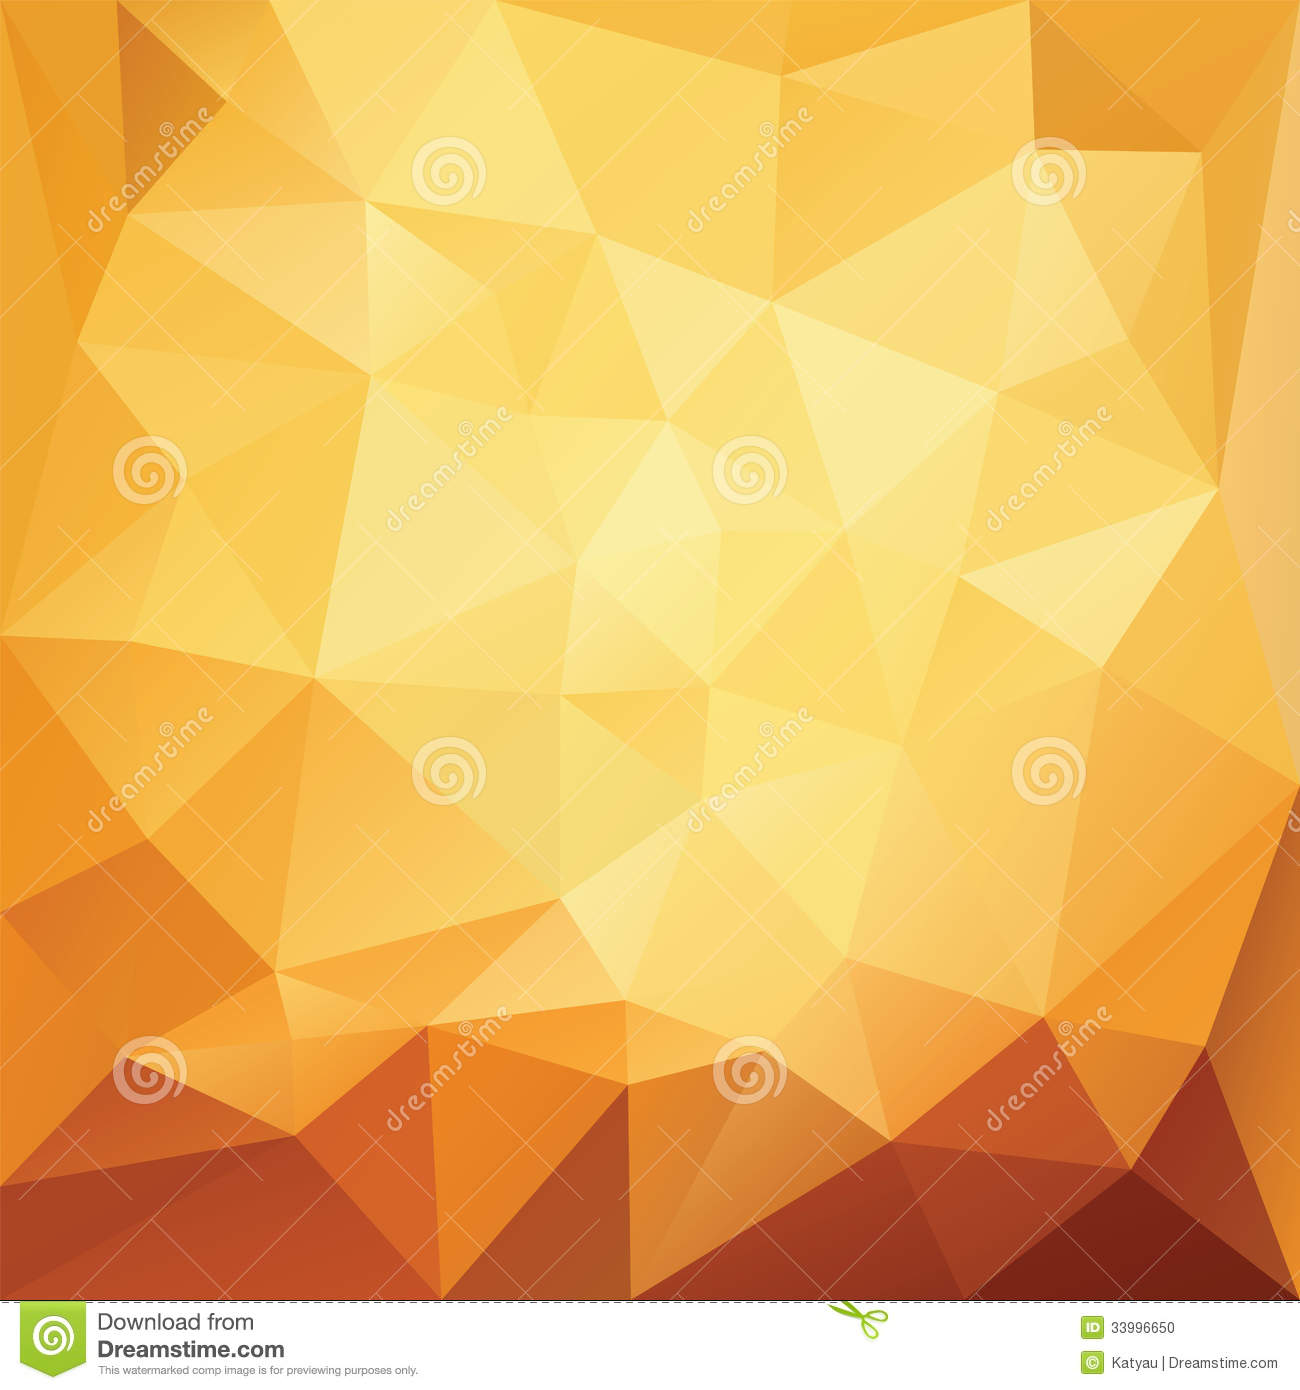 Abstract Geometric Desktop 1300x1390